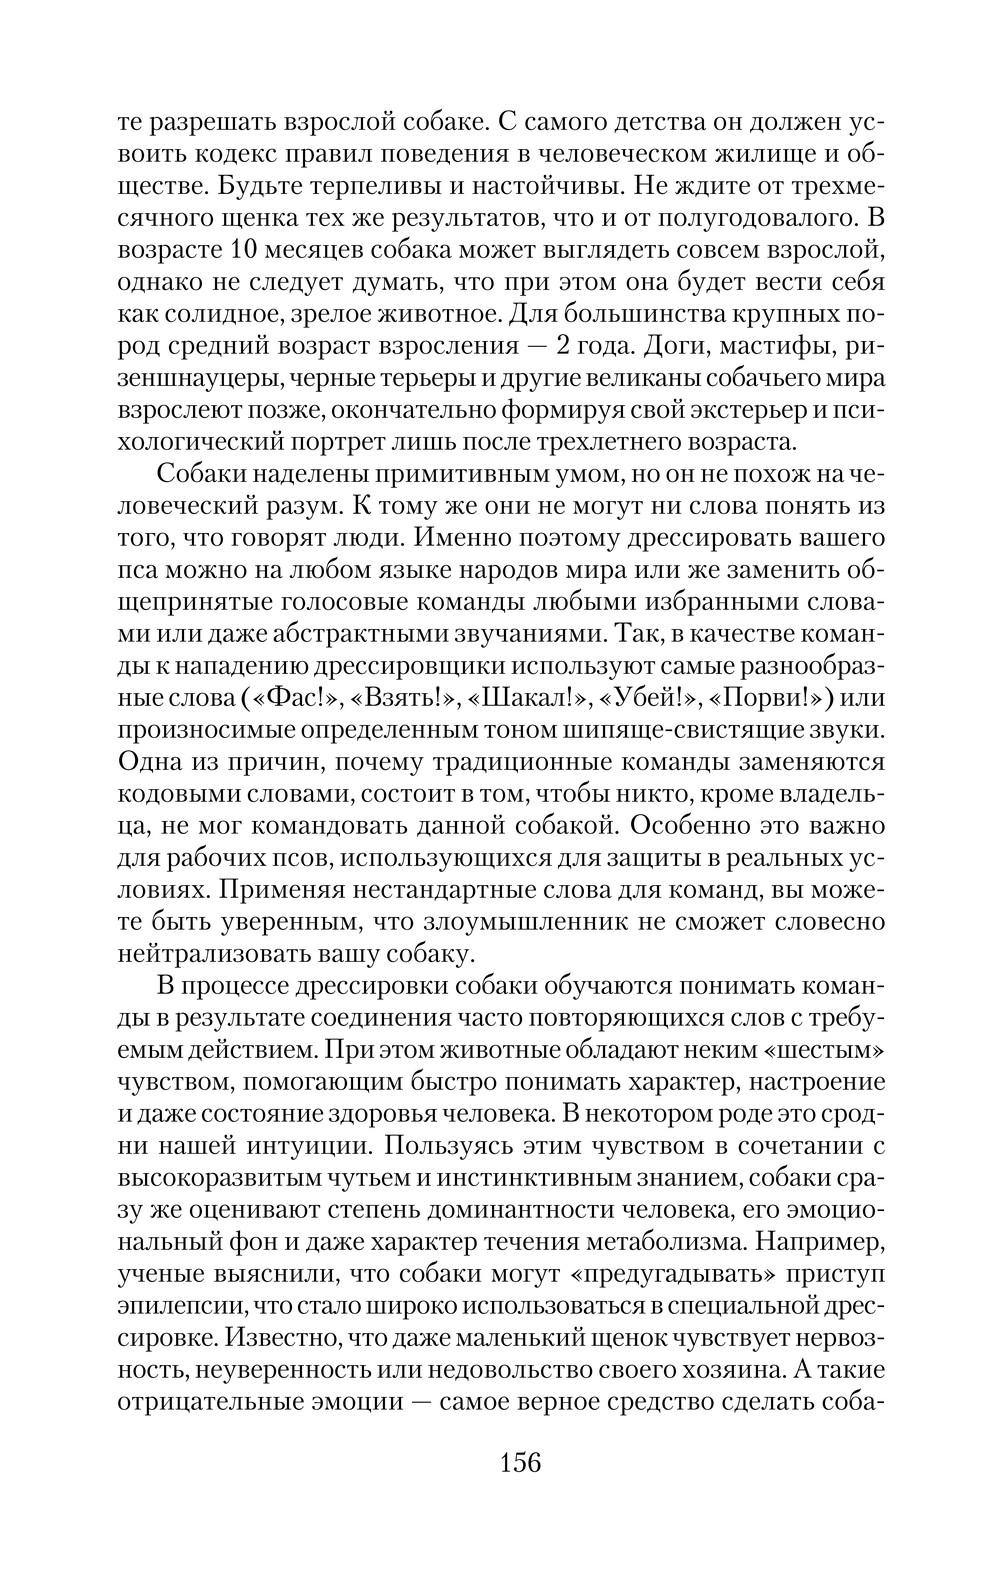 http://i2.imageban.ru/out/2014/01/12/5191238b754cff9349ac32e82398e48c.jpg